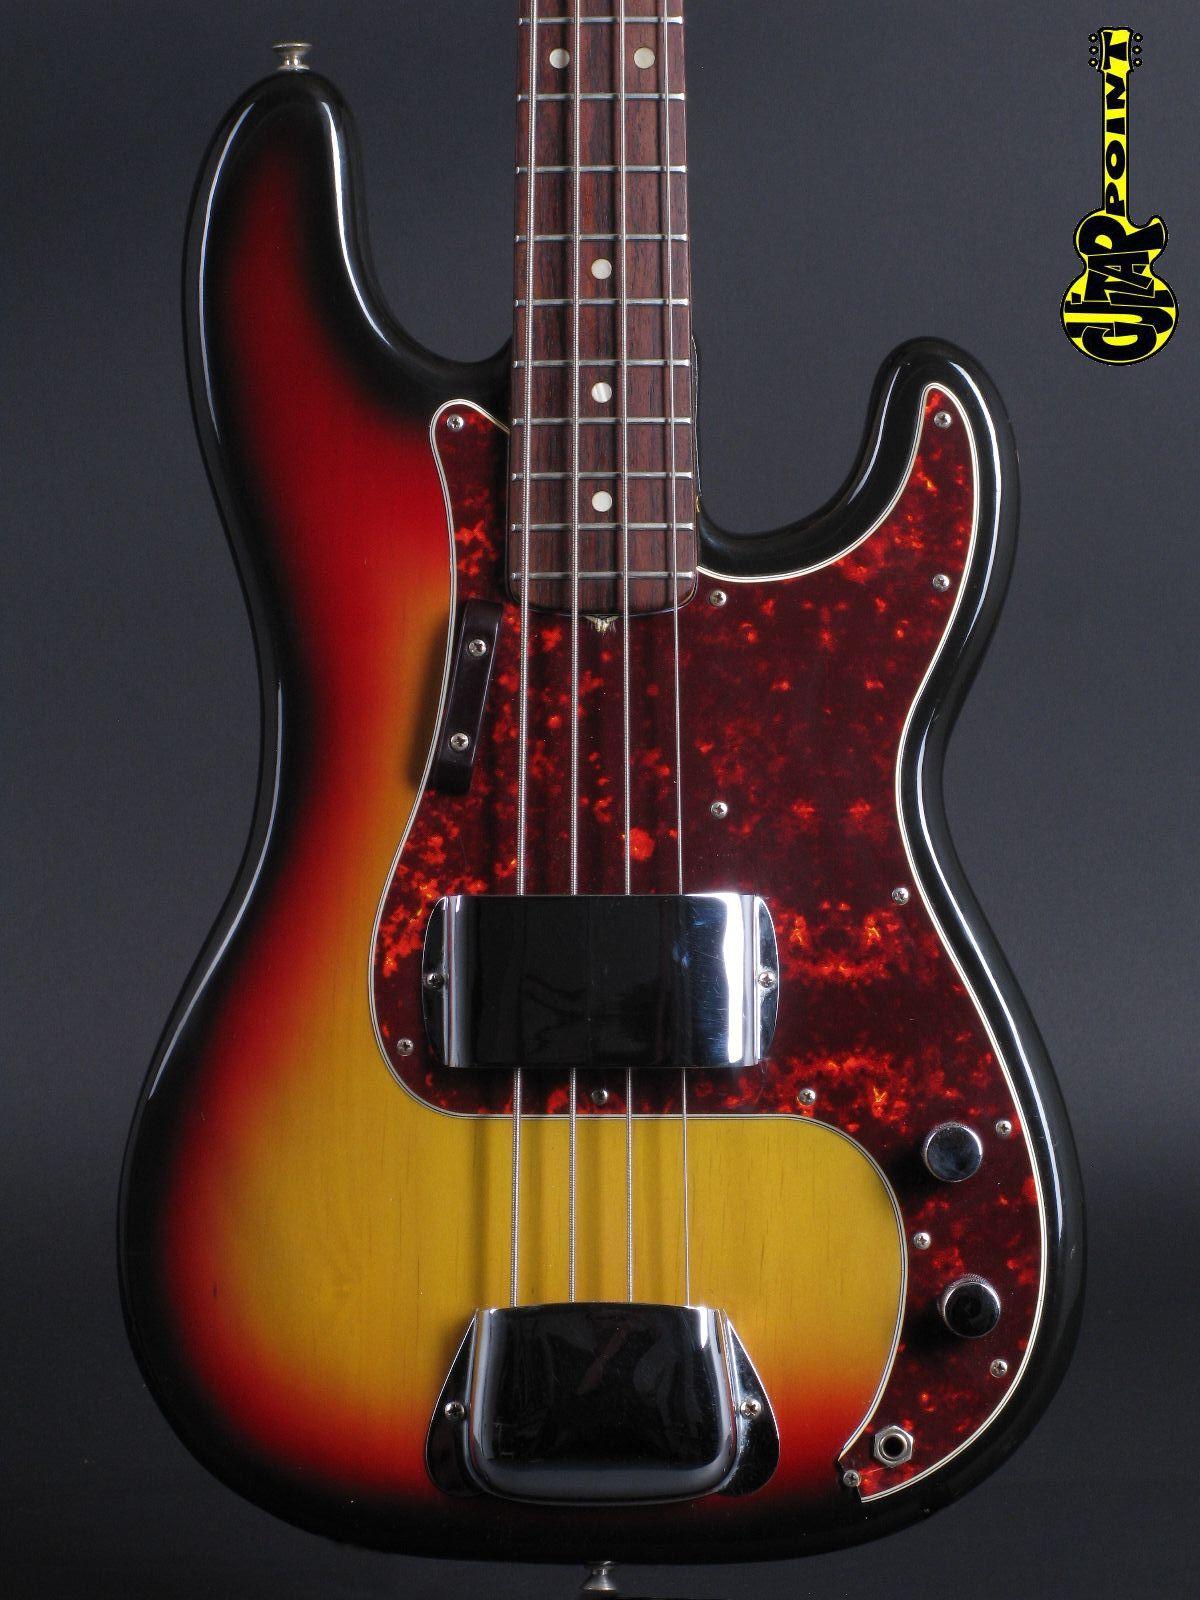 1974 Fender Precision Bass - 3-tone Sunburst